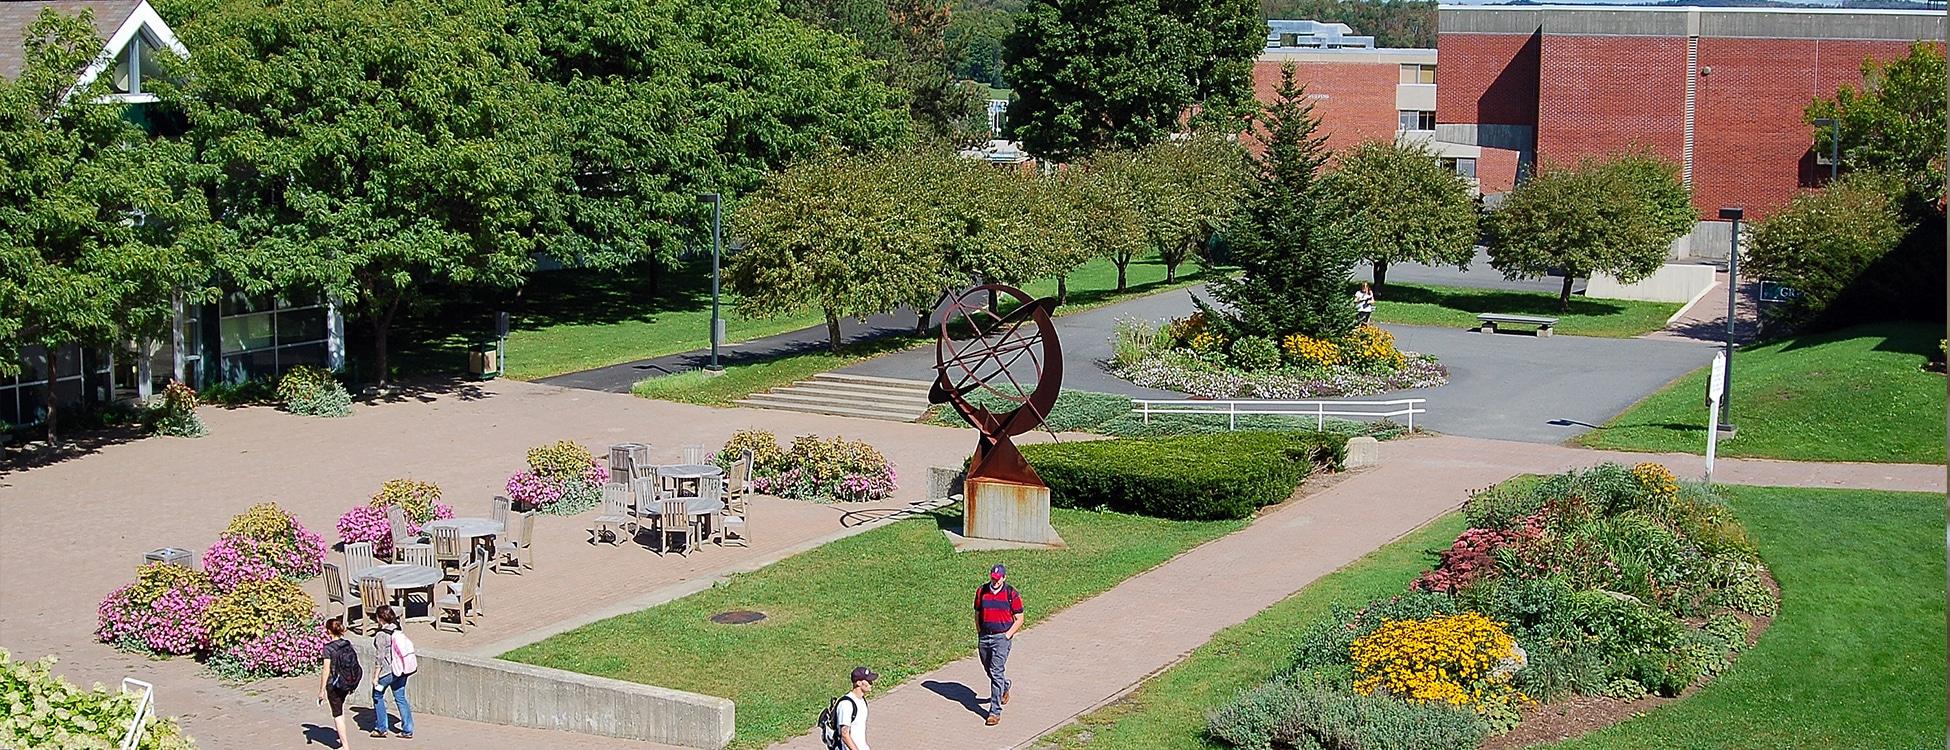 Randolph Center campus, beautiful, students walking, pathways, sculpture